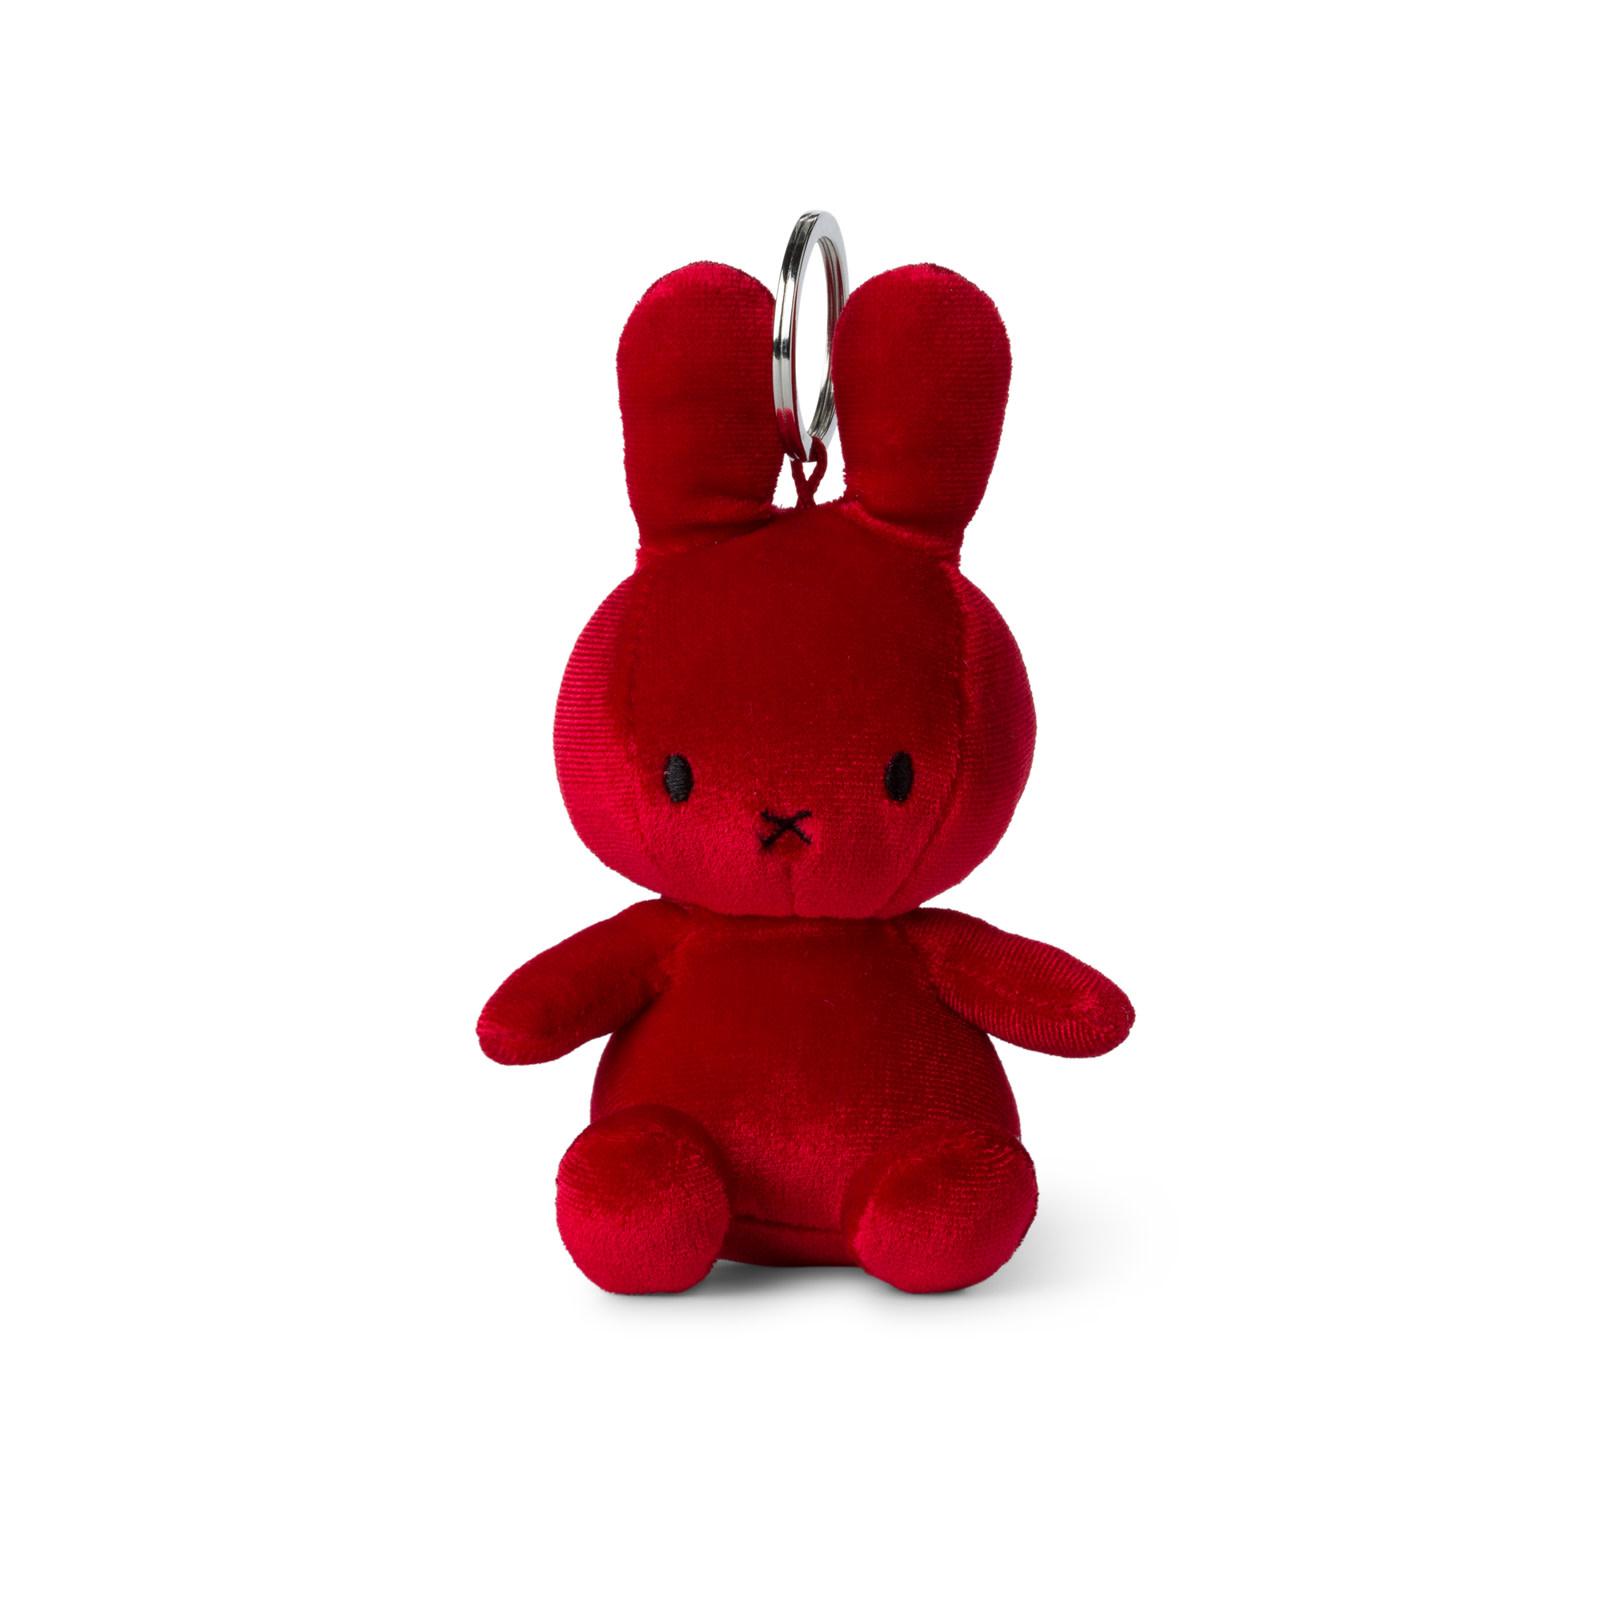 Nijntje/Miffy/Snuffy Miffy Keychain Velvet Candy Red - 10 cm